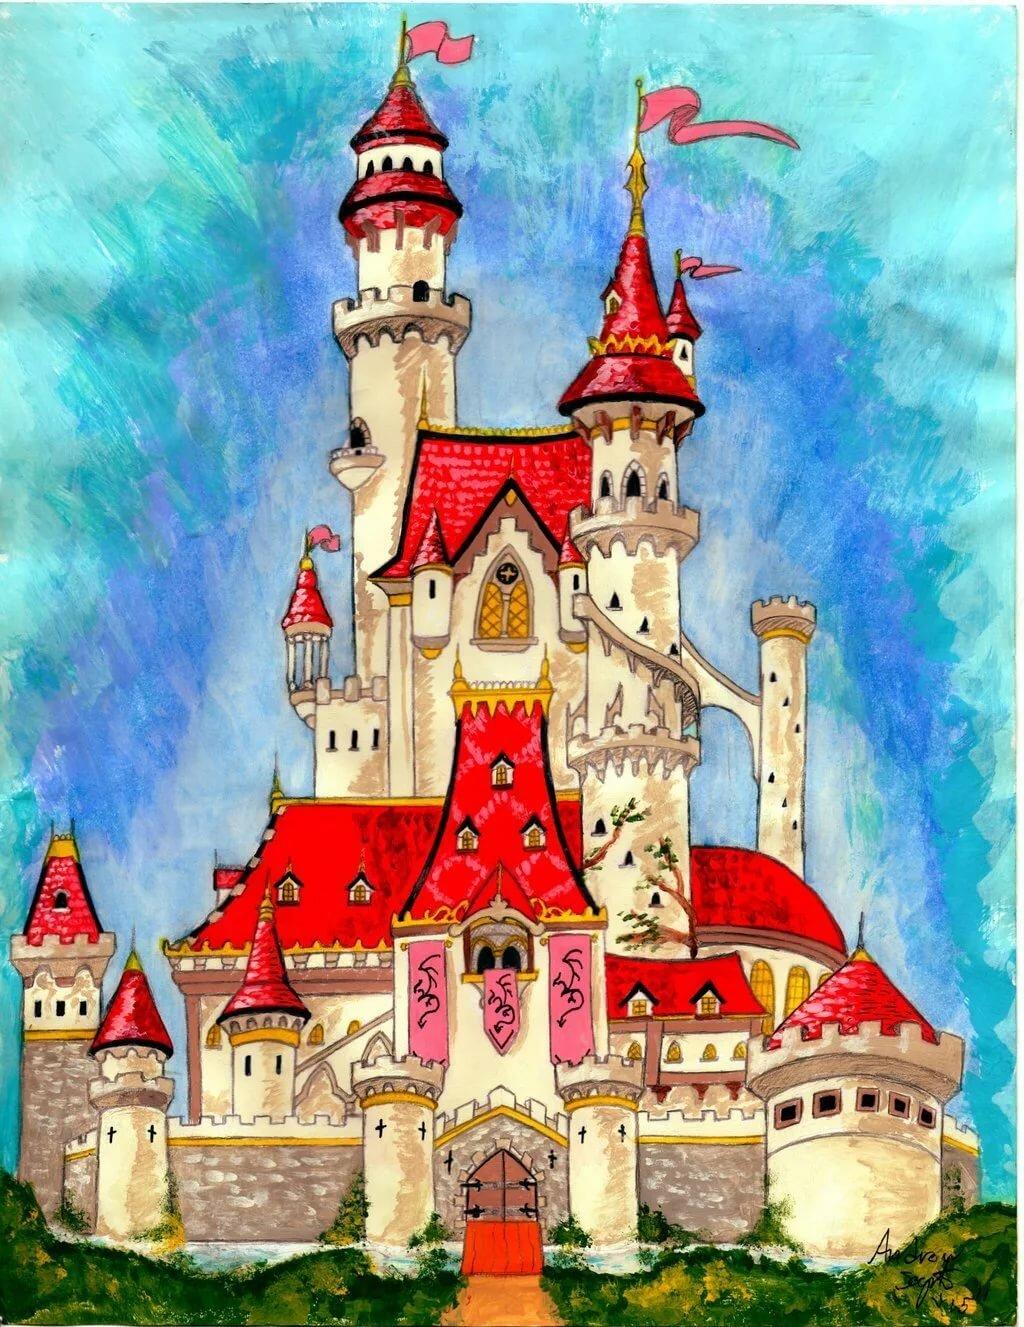 картинка цветного дворца фото